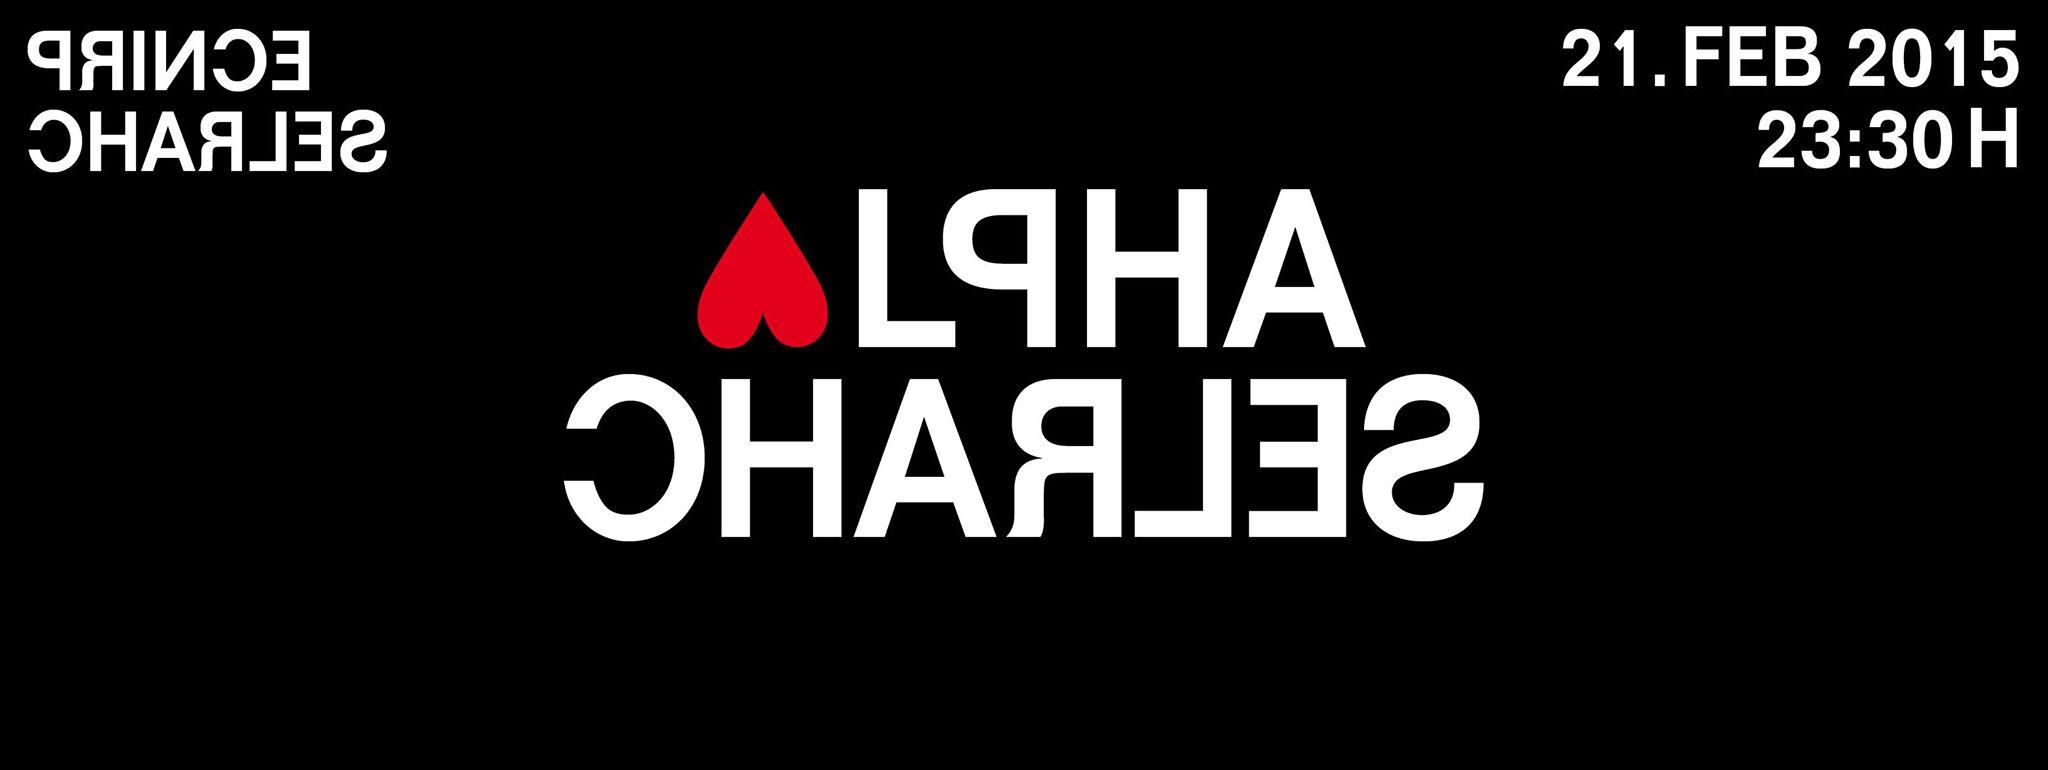 alphaxcharles